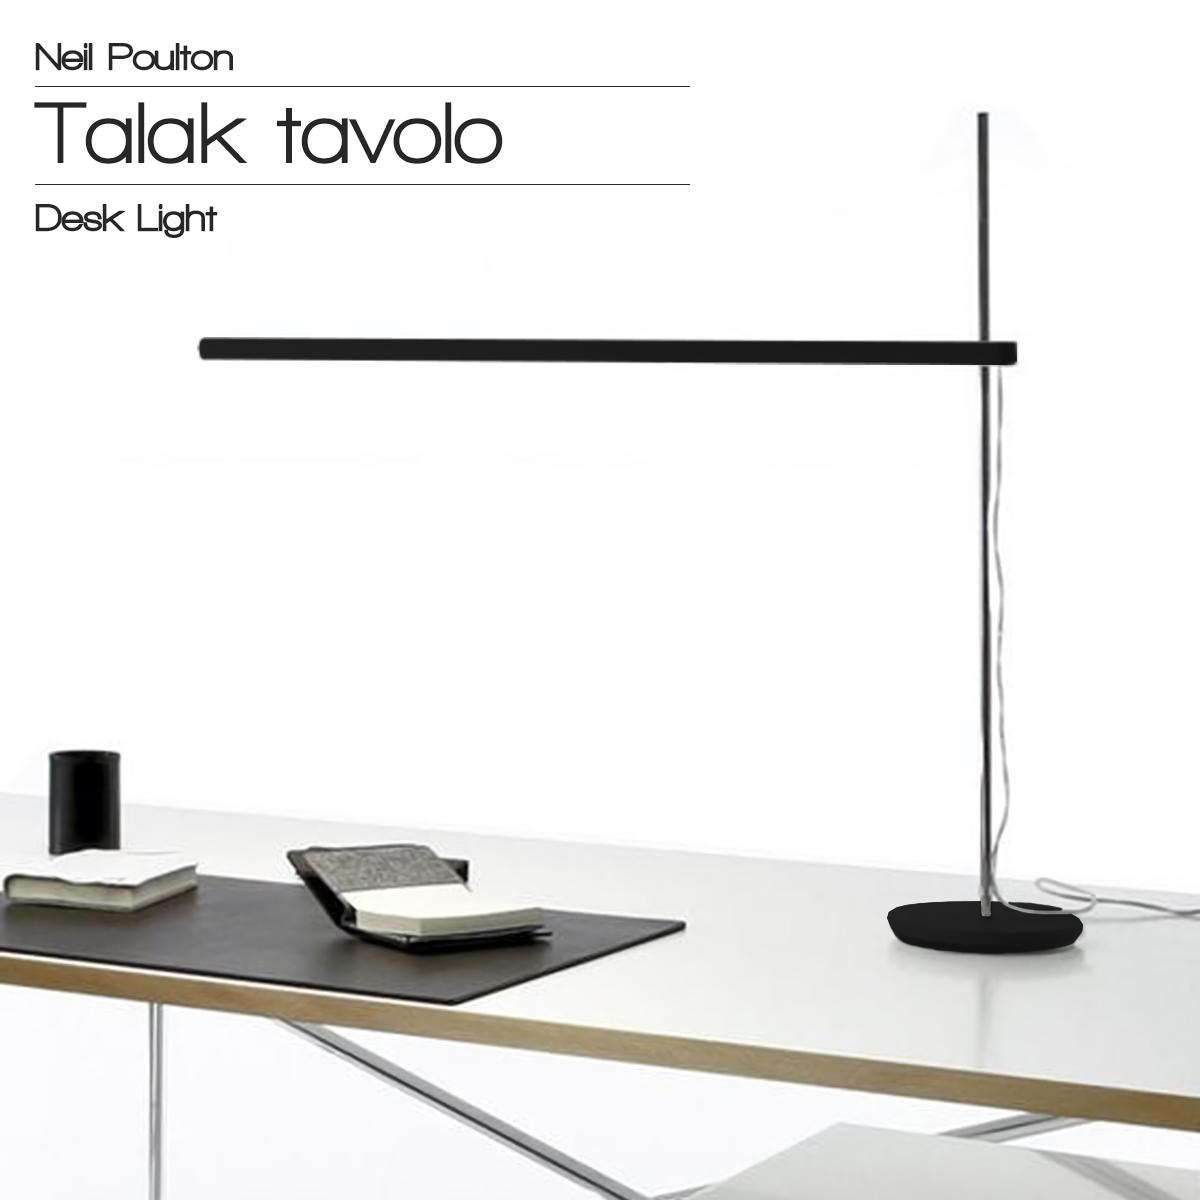 Talak Tavolo タラク タボロ Neil Poulton ニール・ポールトン デスクライト スタンドライト LED デザイナーズ照明 オフィス照明